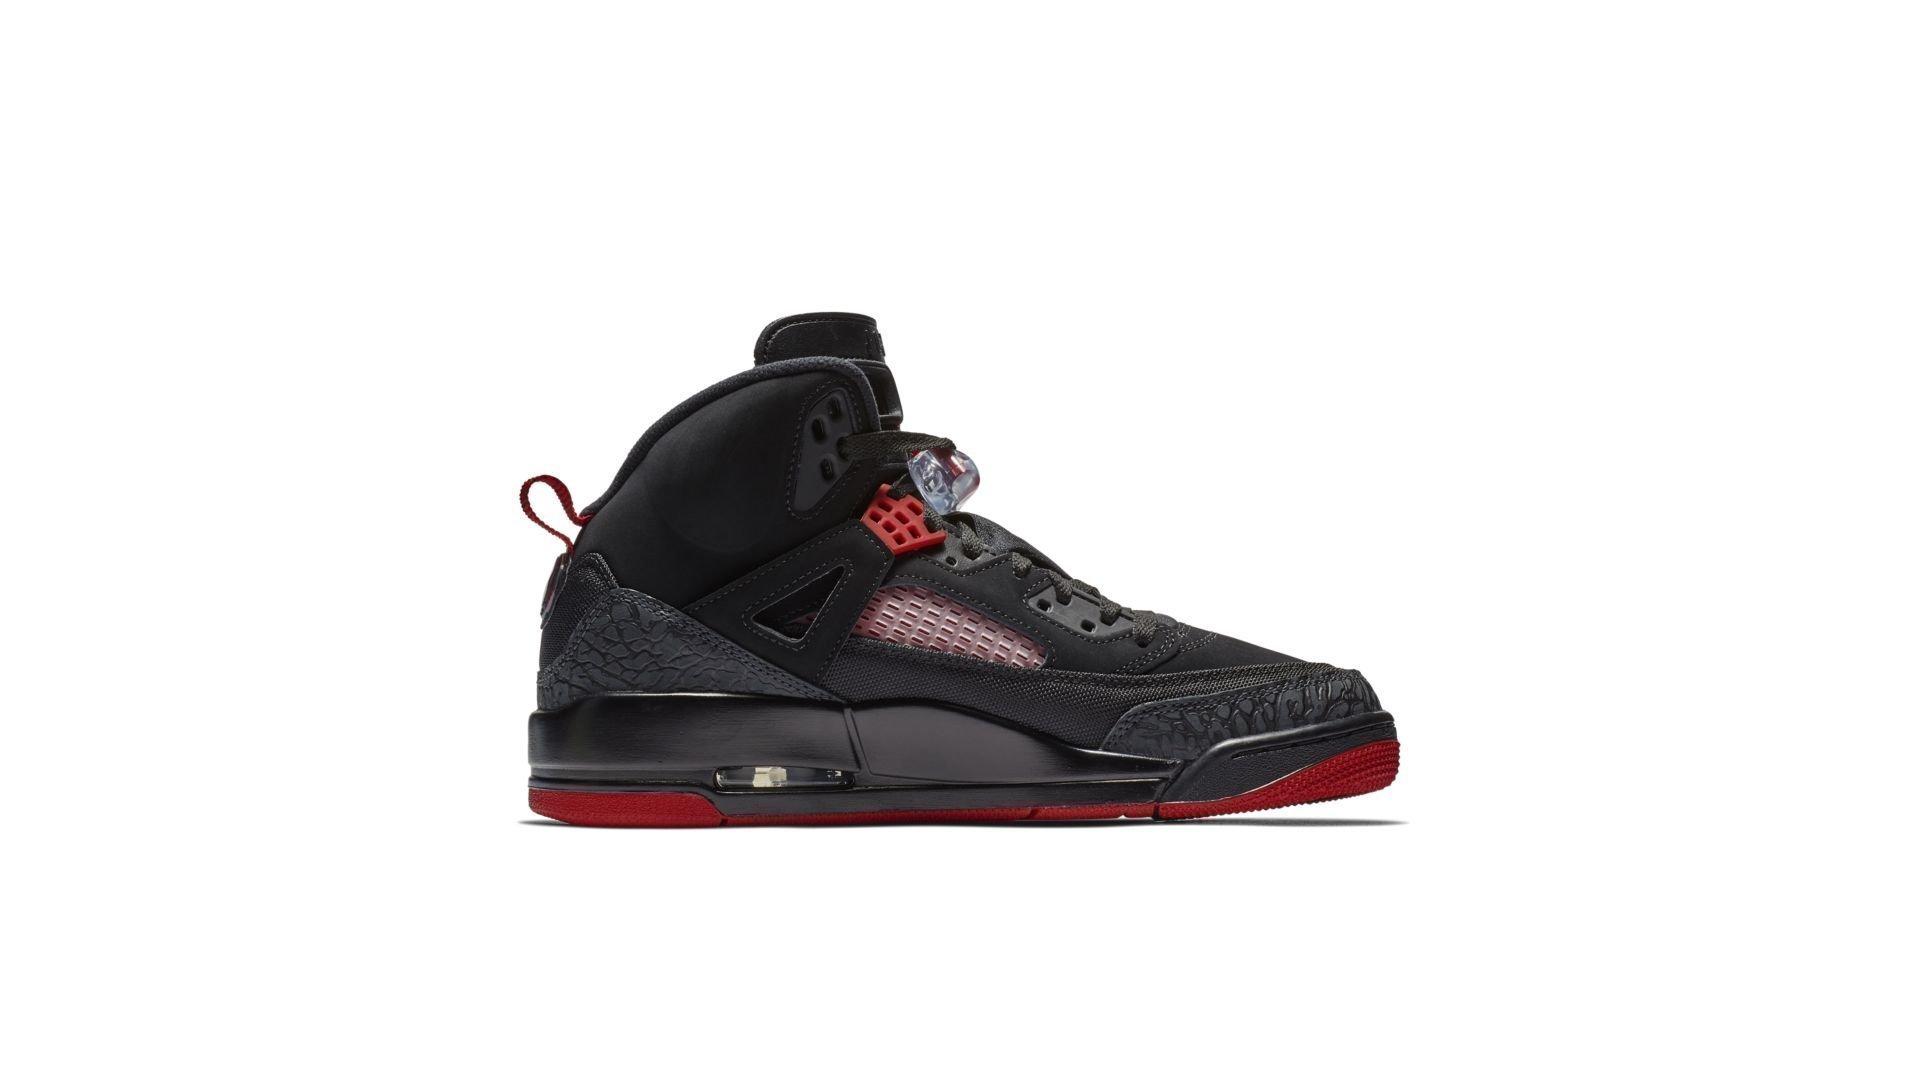 Jordan Spizike Black Gym Red (315371-006)